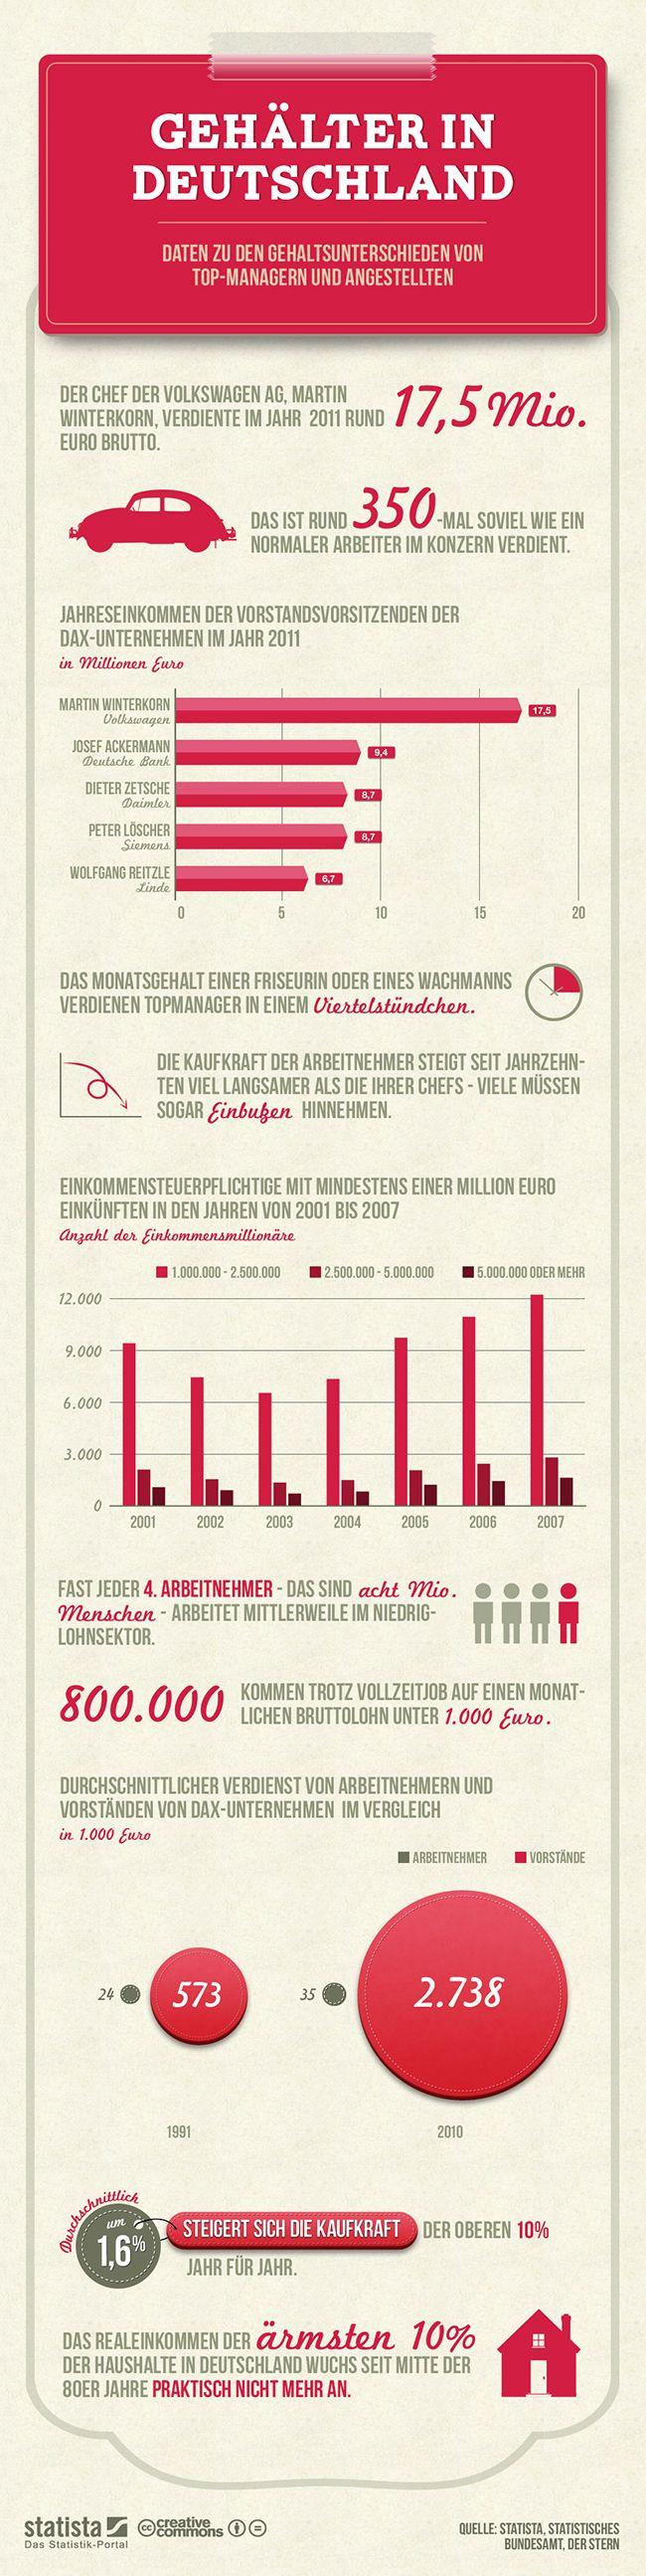 Gehälter in Deutschland #Infografik -   Salaries in Germany #infographic #salary